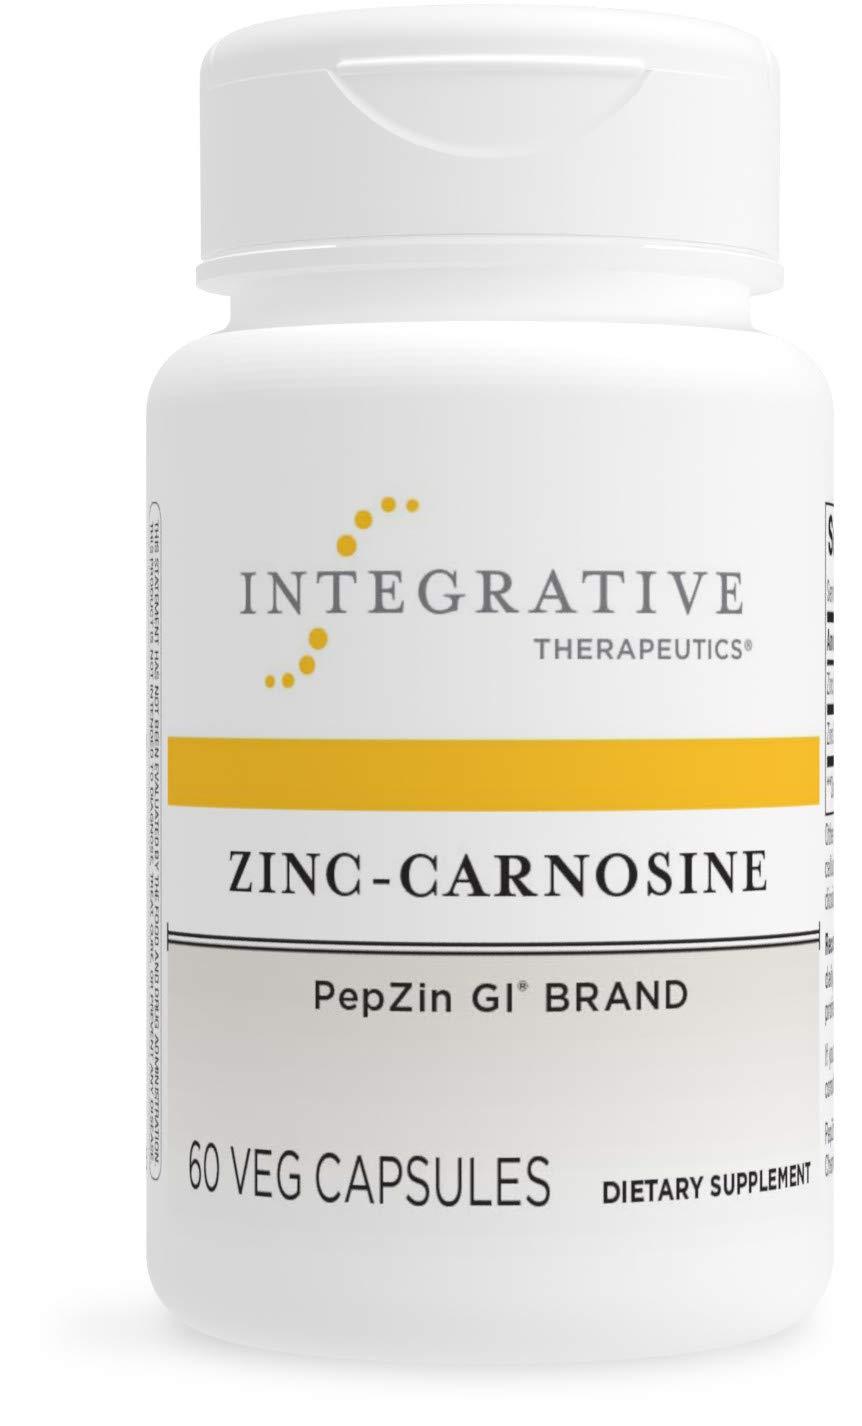 Integrative Therapeutics - Zinc Carnosine - PepZin GI - Elemental Zinc Suppplement - Stomach Lining Support - 75mg Zinc - 60 Capsules